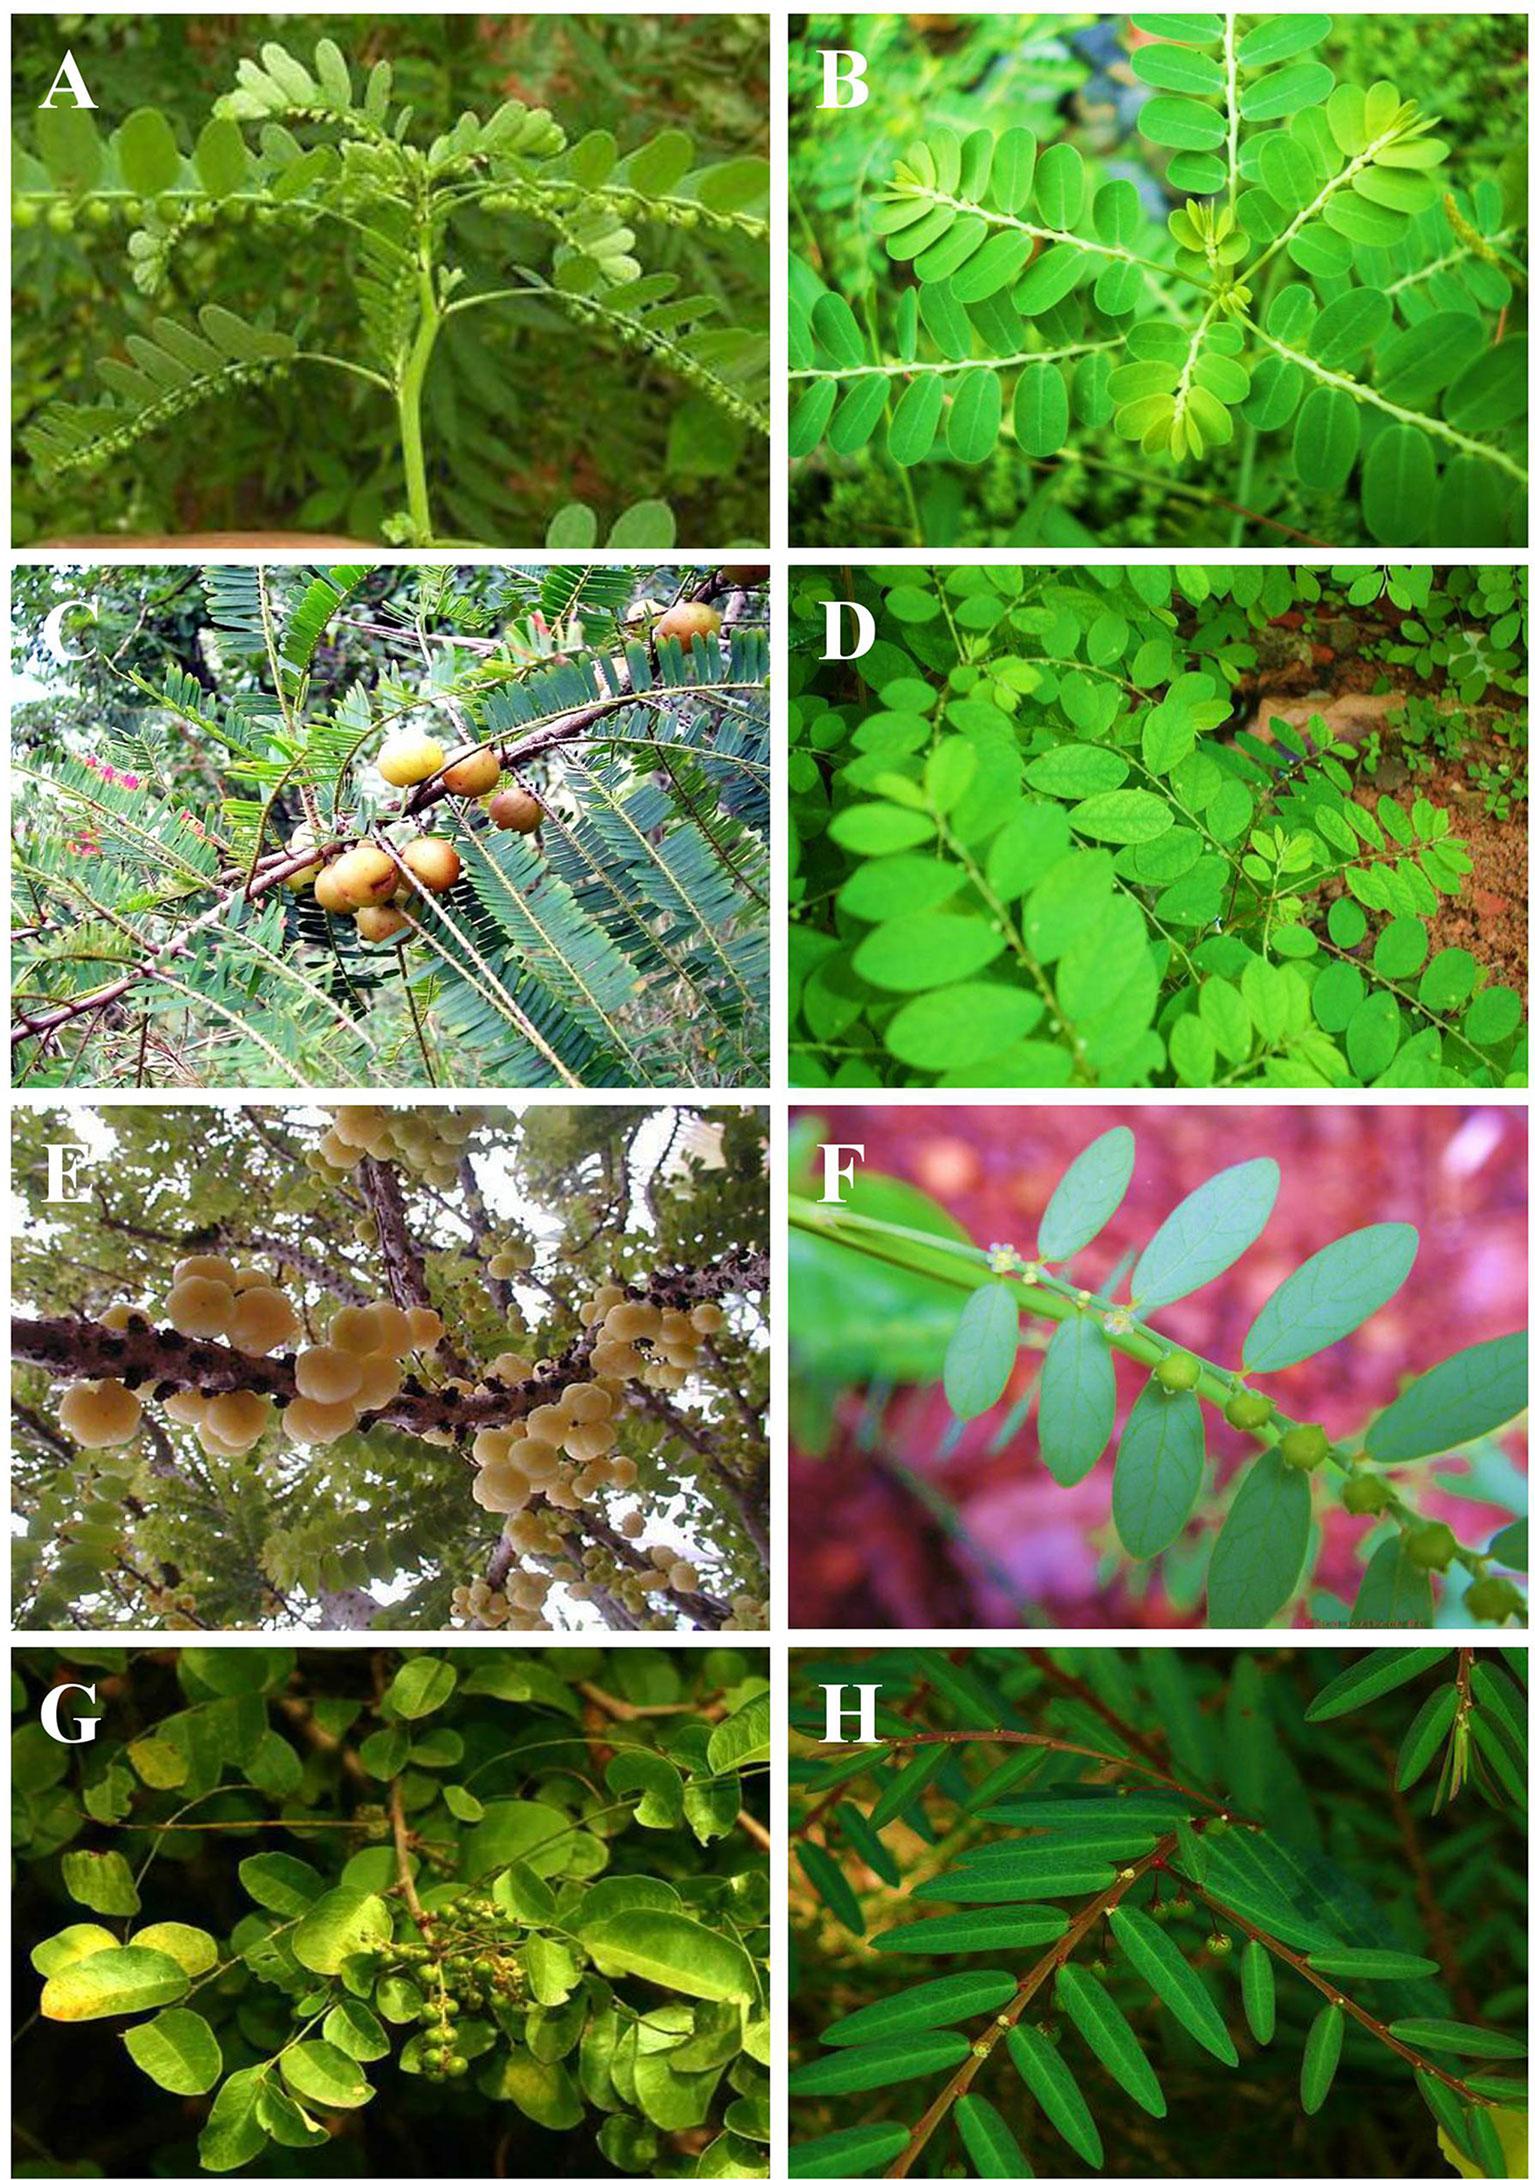 100 seeds Phyllanthus niruri,herb,Current plan,maintain,Control,Blood sugar